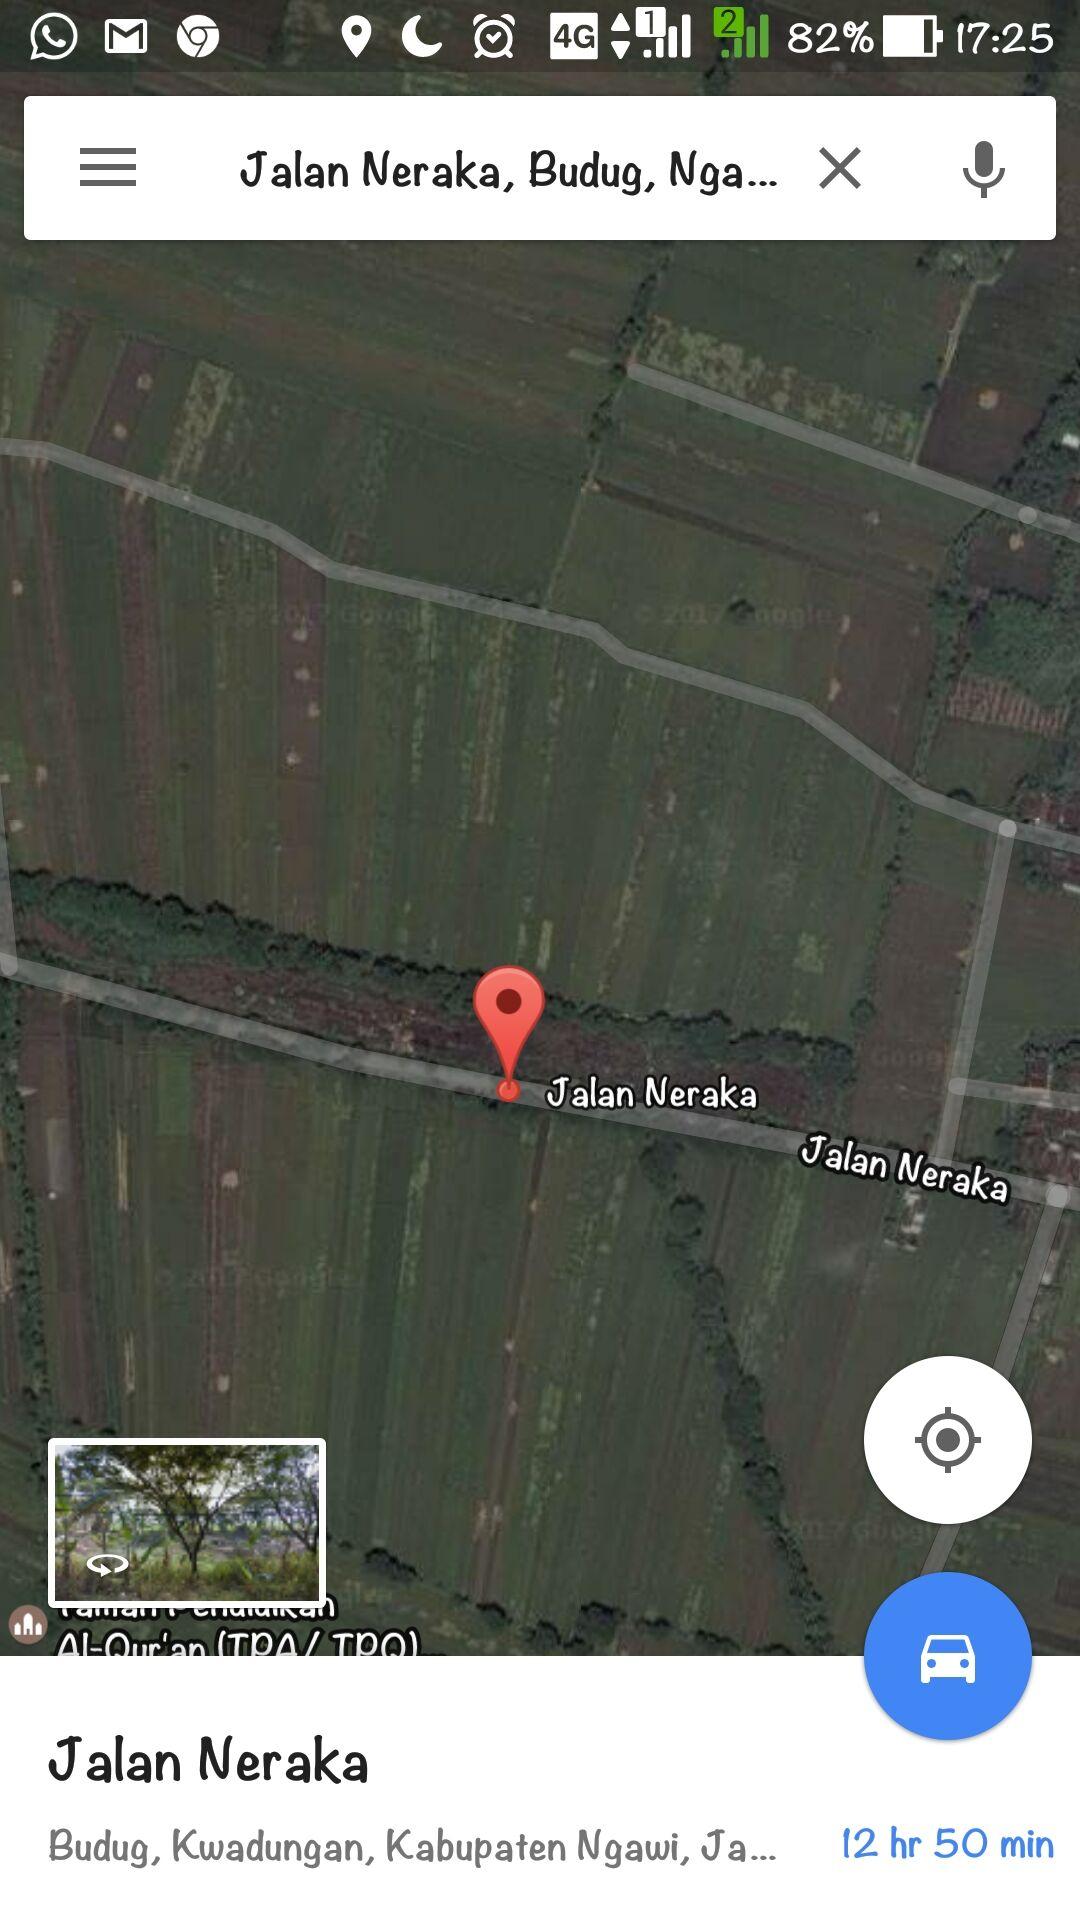 Nama Jalan Aneh Di Google Maps 12